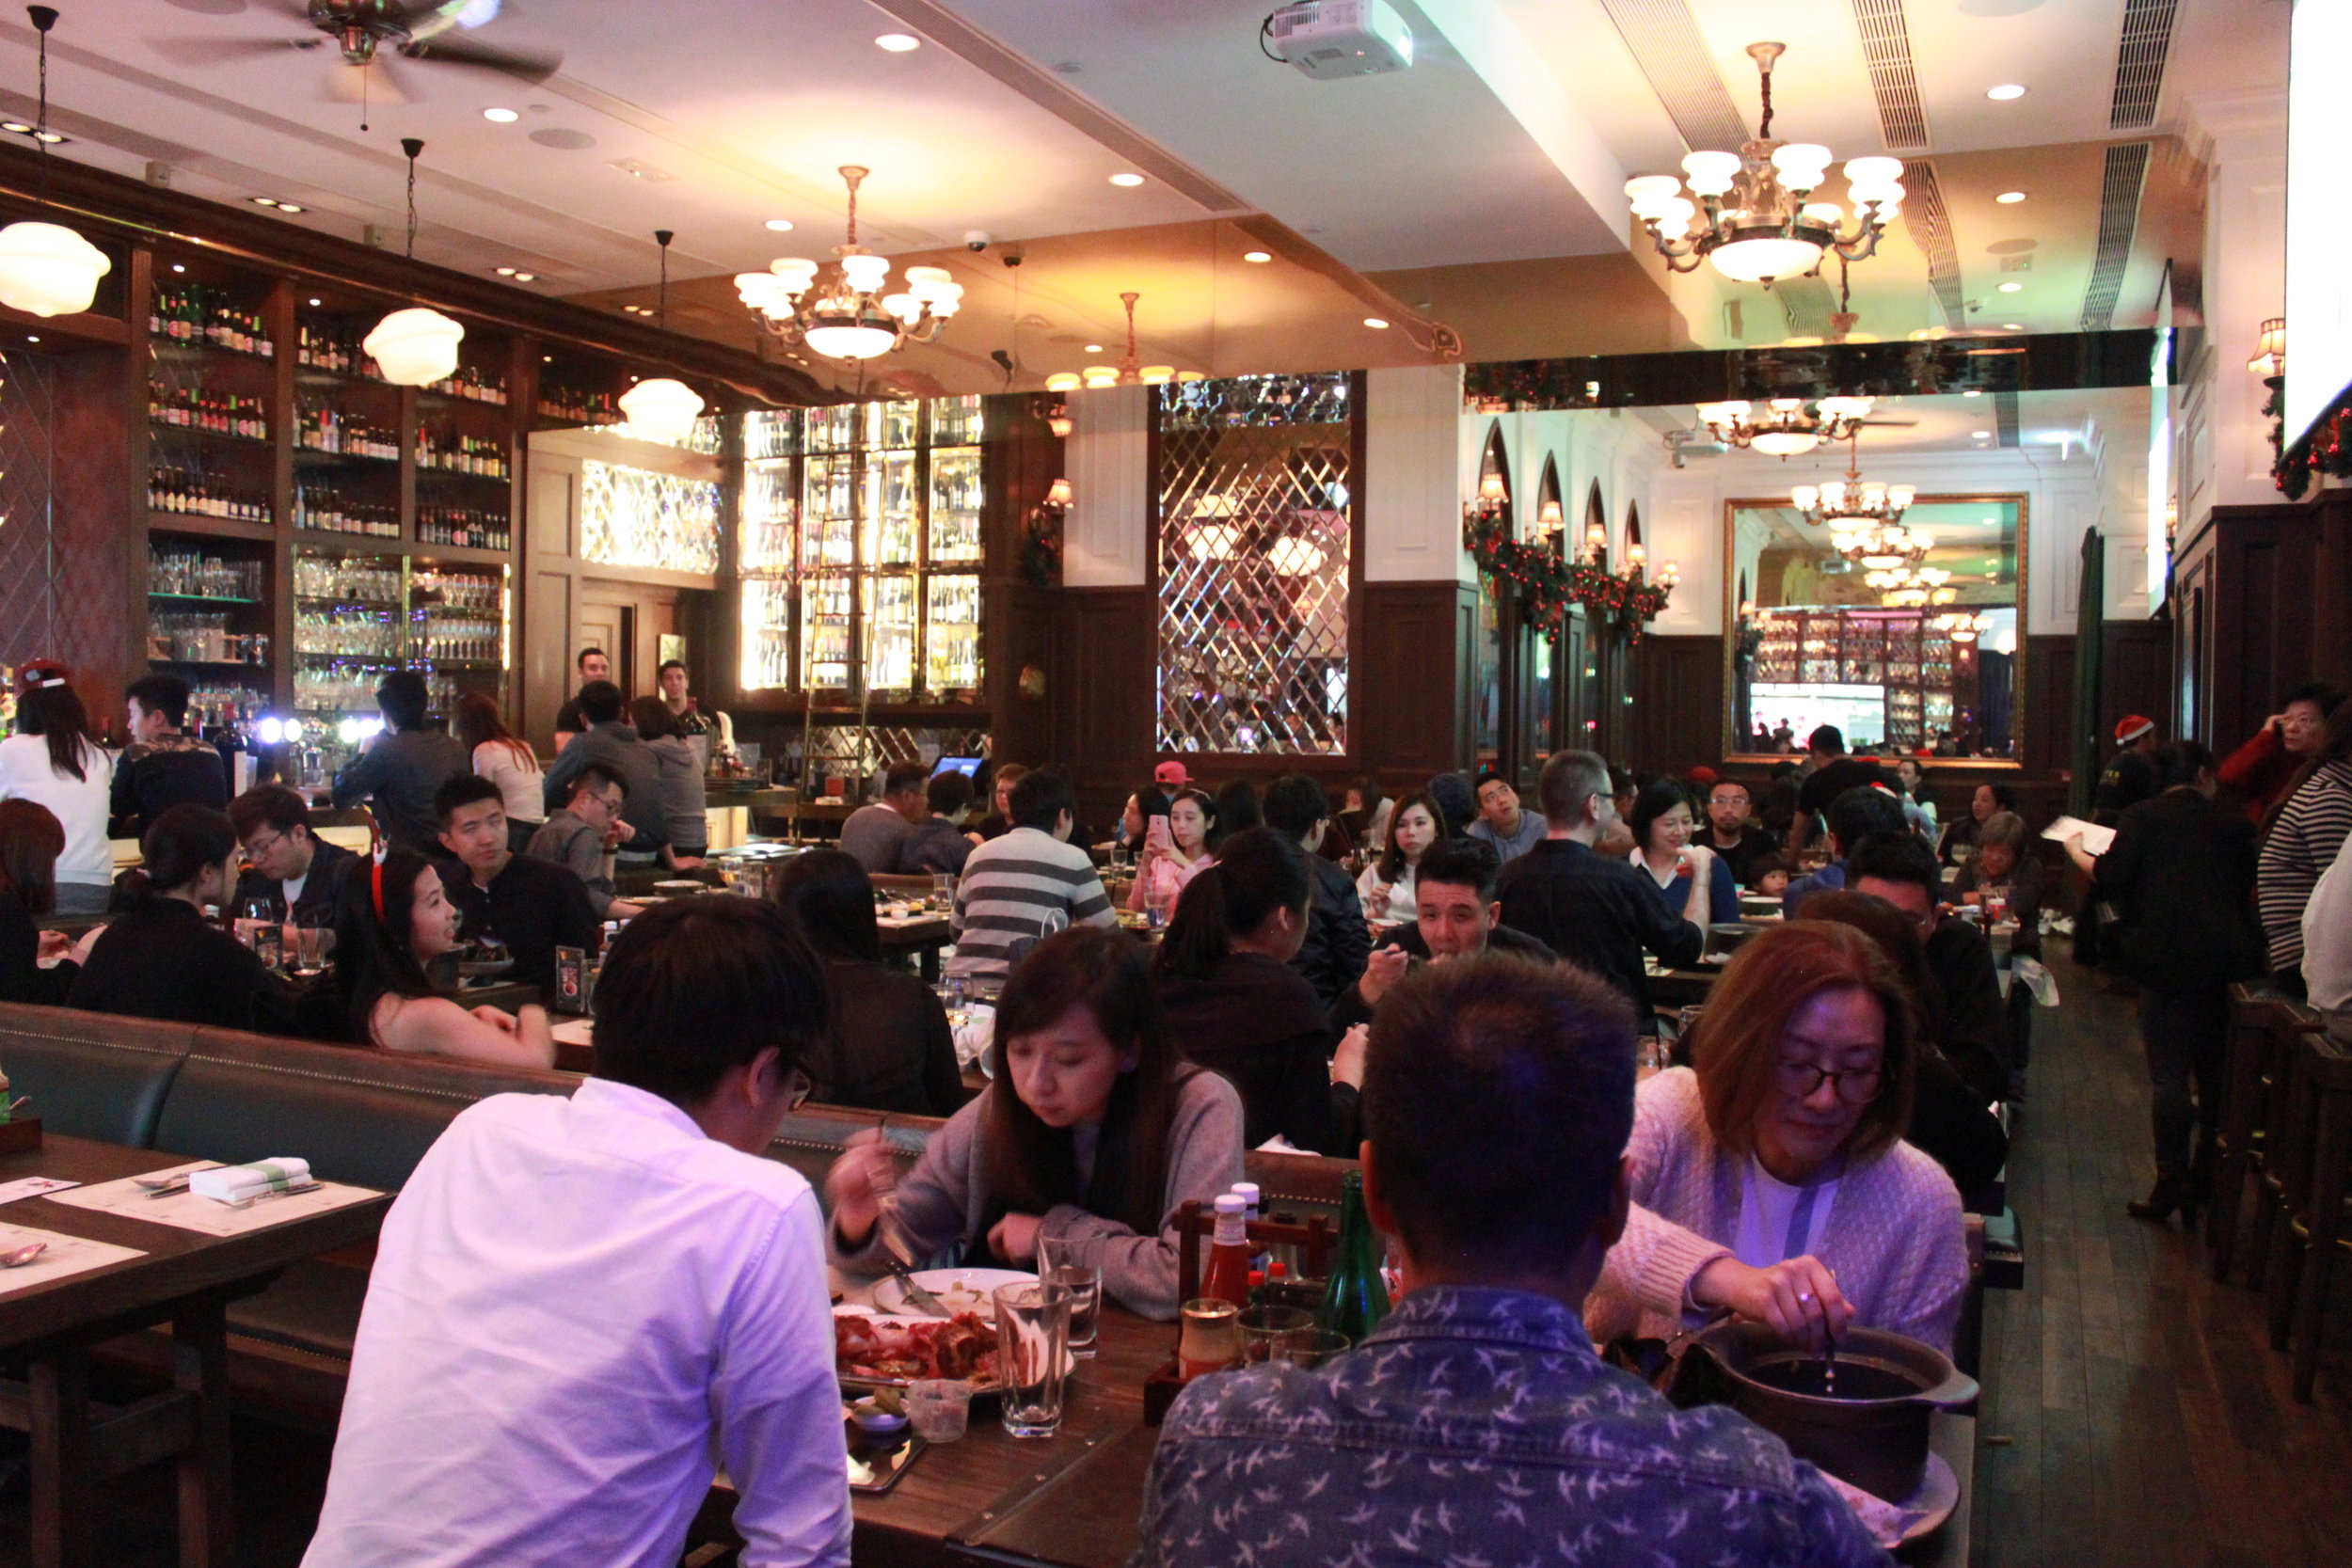 Restaurant: FRITES Belgium on Tap Shop 1, G/F, Park Haven, 38 Haven Street, Causeway Bay